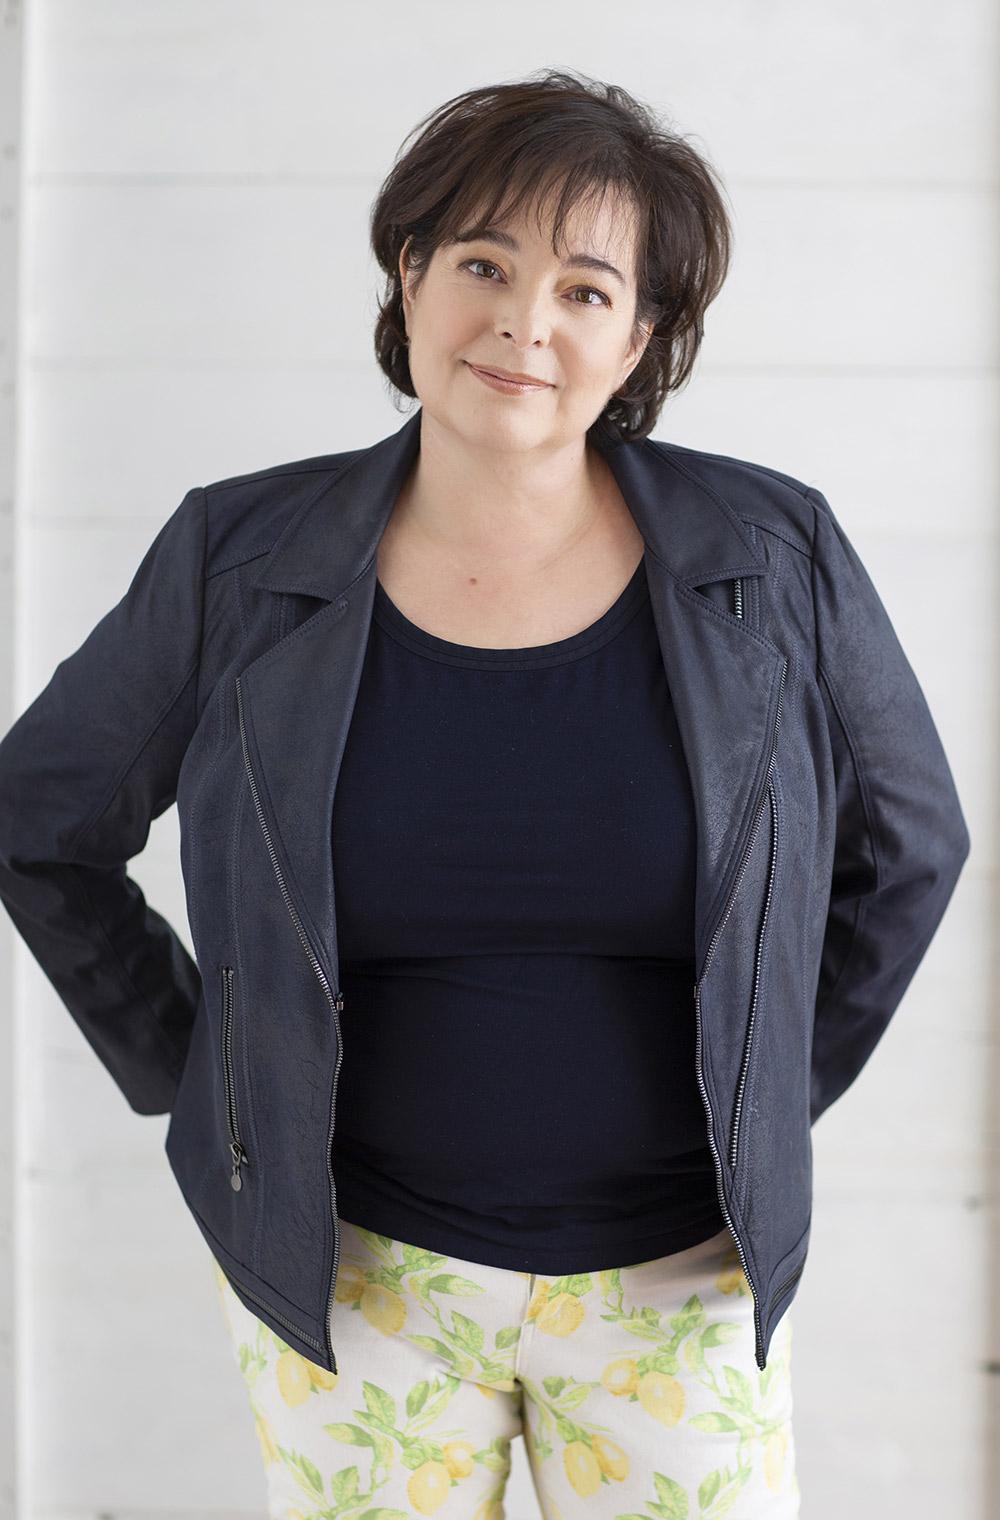 Cardiologist Gabrielle Horne